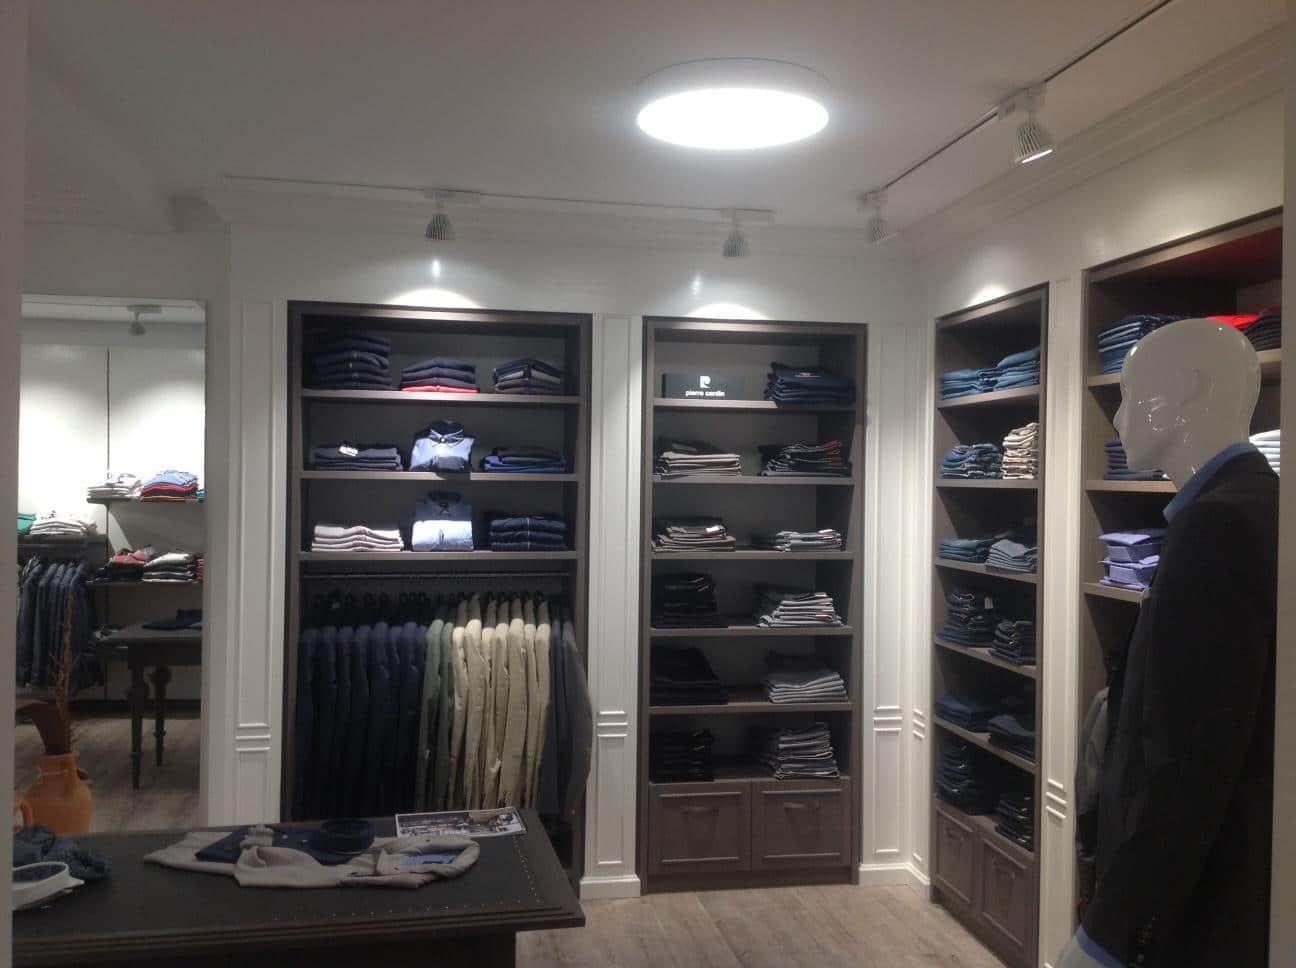 Shopbeleuchtung & Konzepte